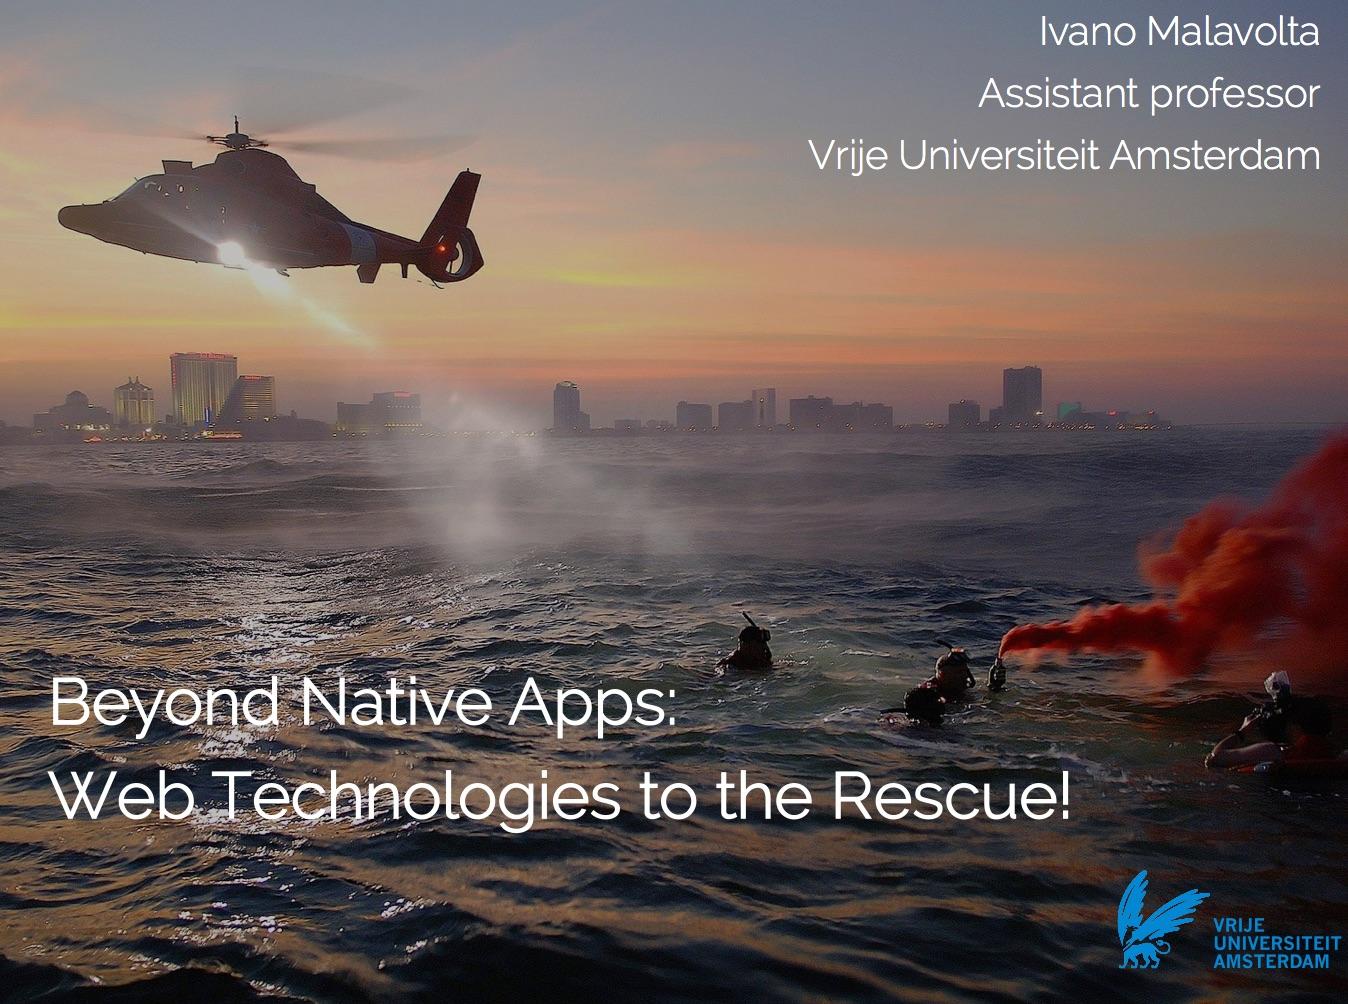 Beyond Native Apps: Web Technologies to the Rescue! [SPLASH 2016 – Mobile! keynote]